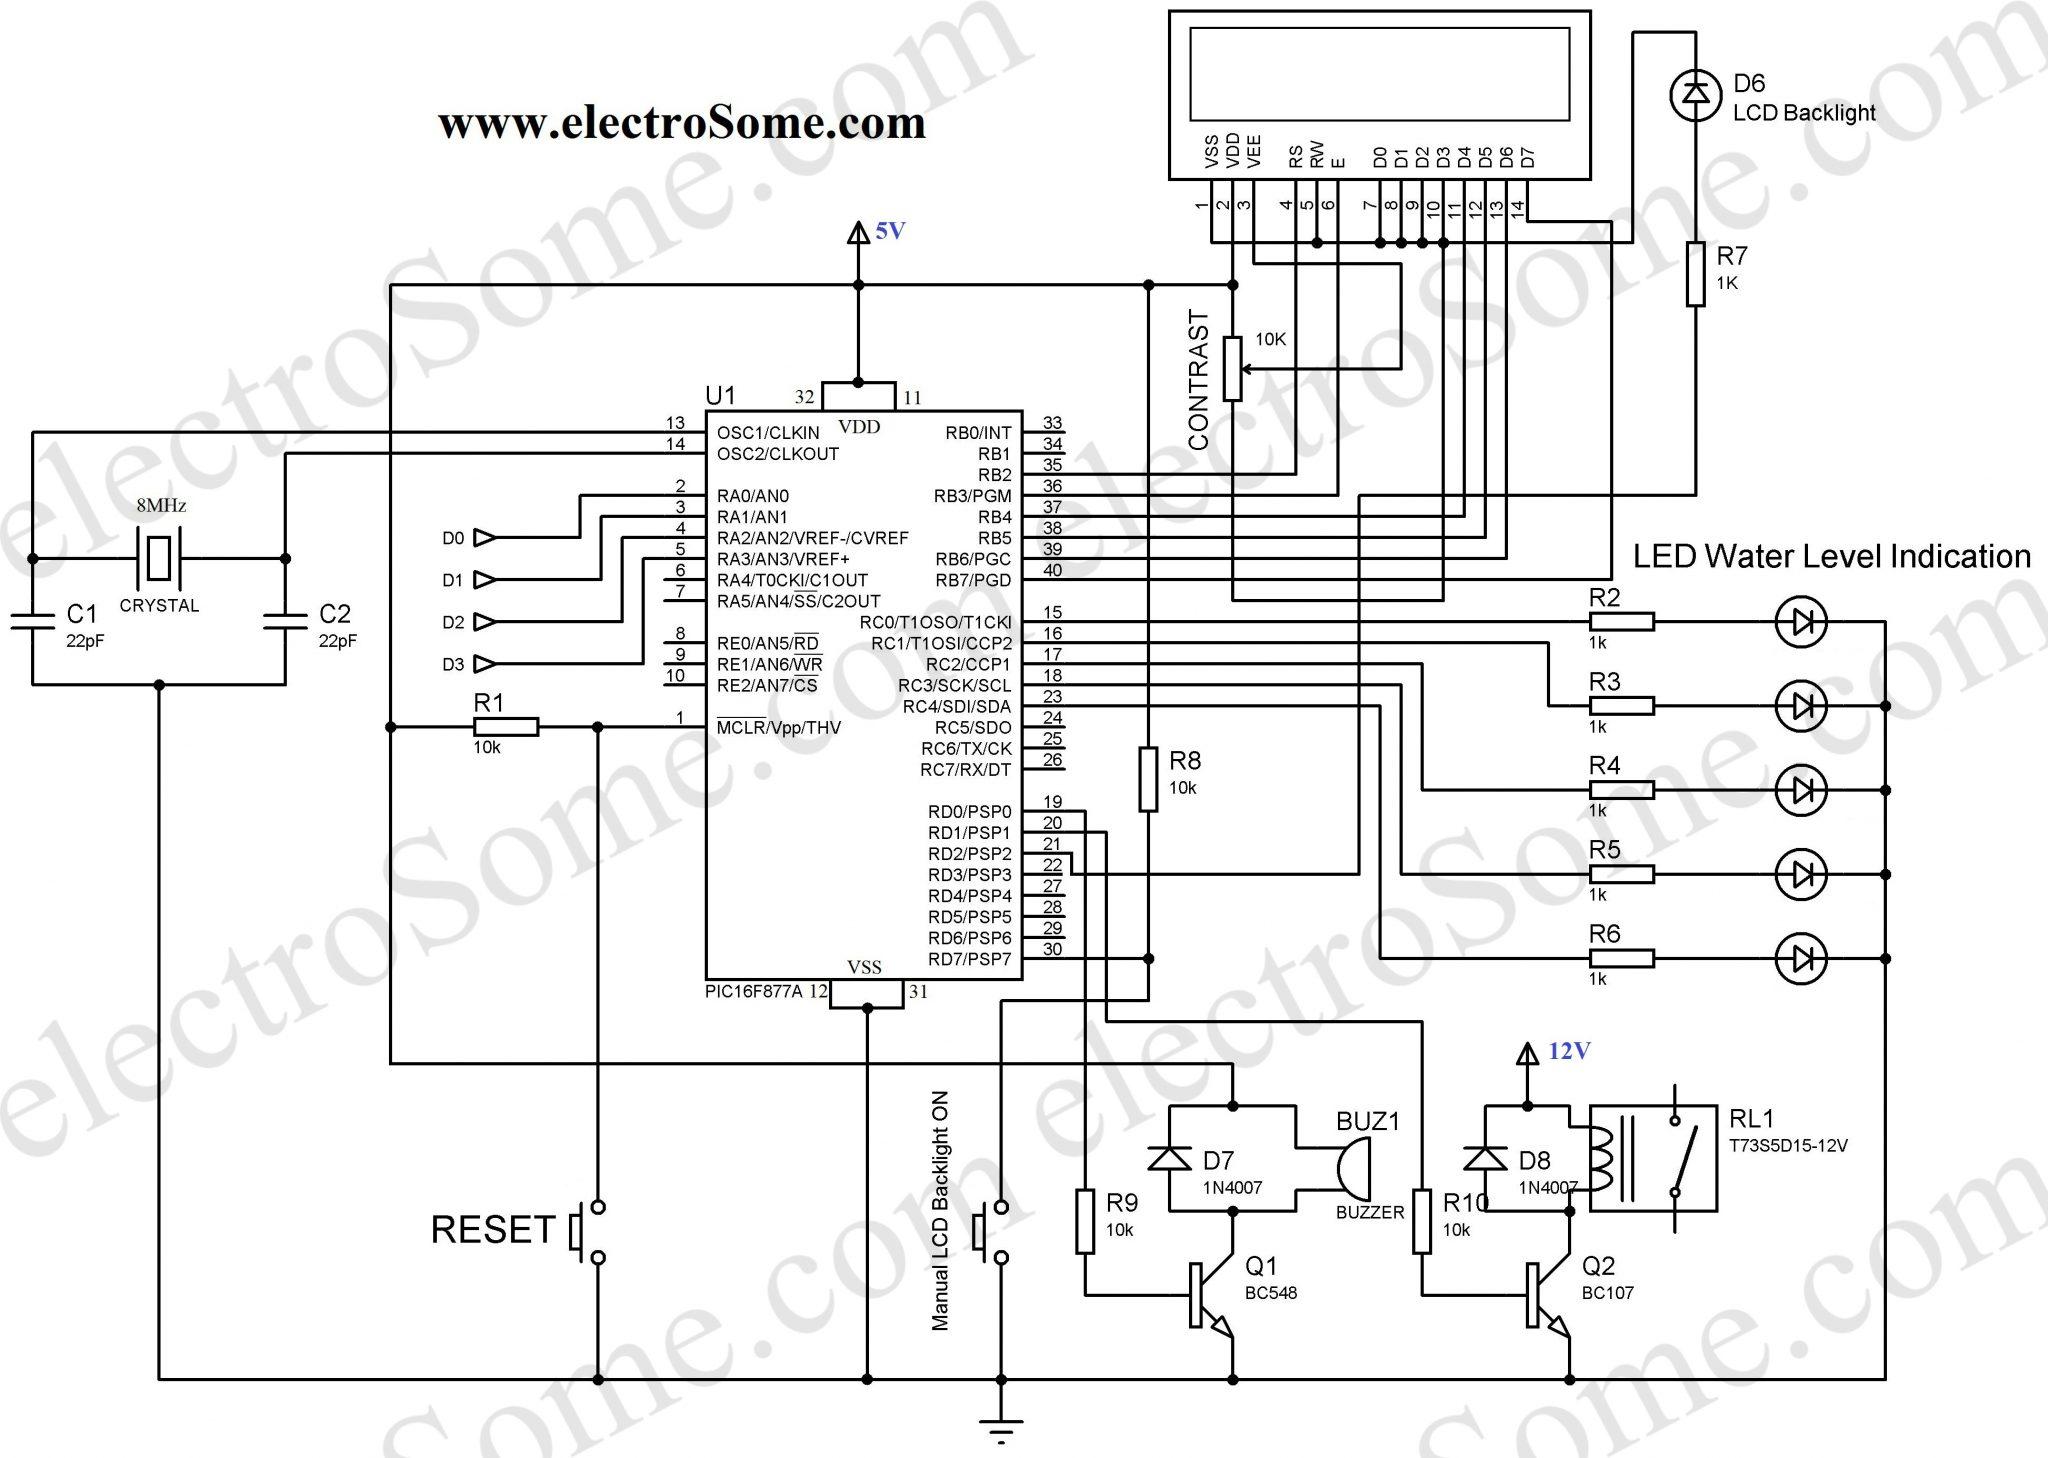 Room Monitoring Wiring Diagram